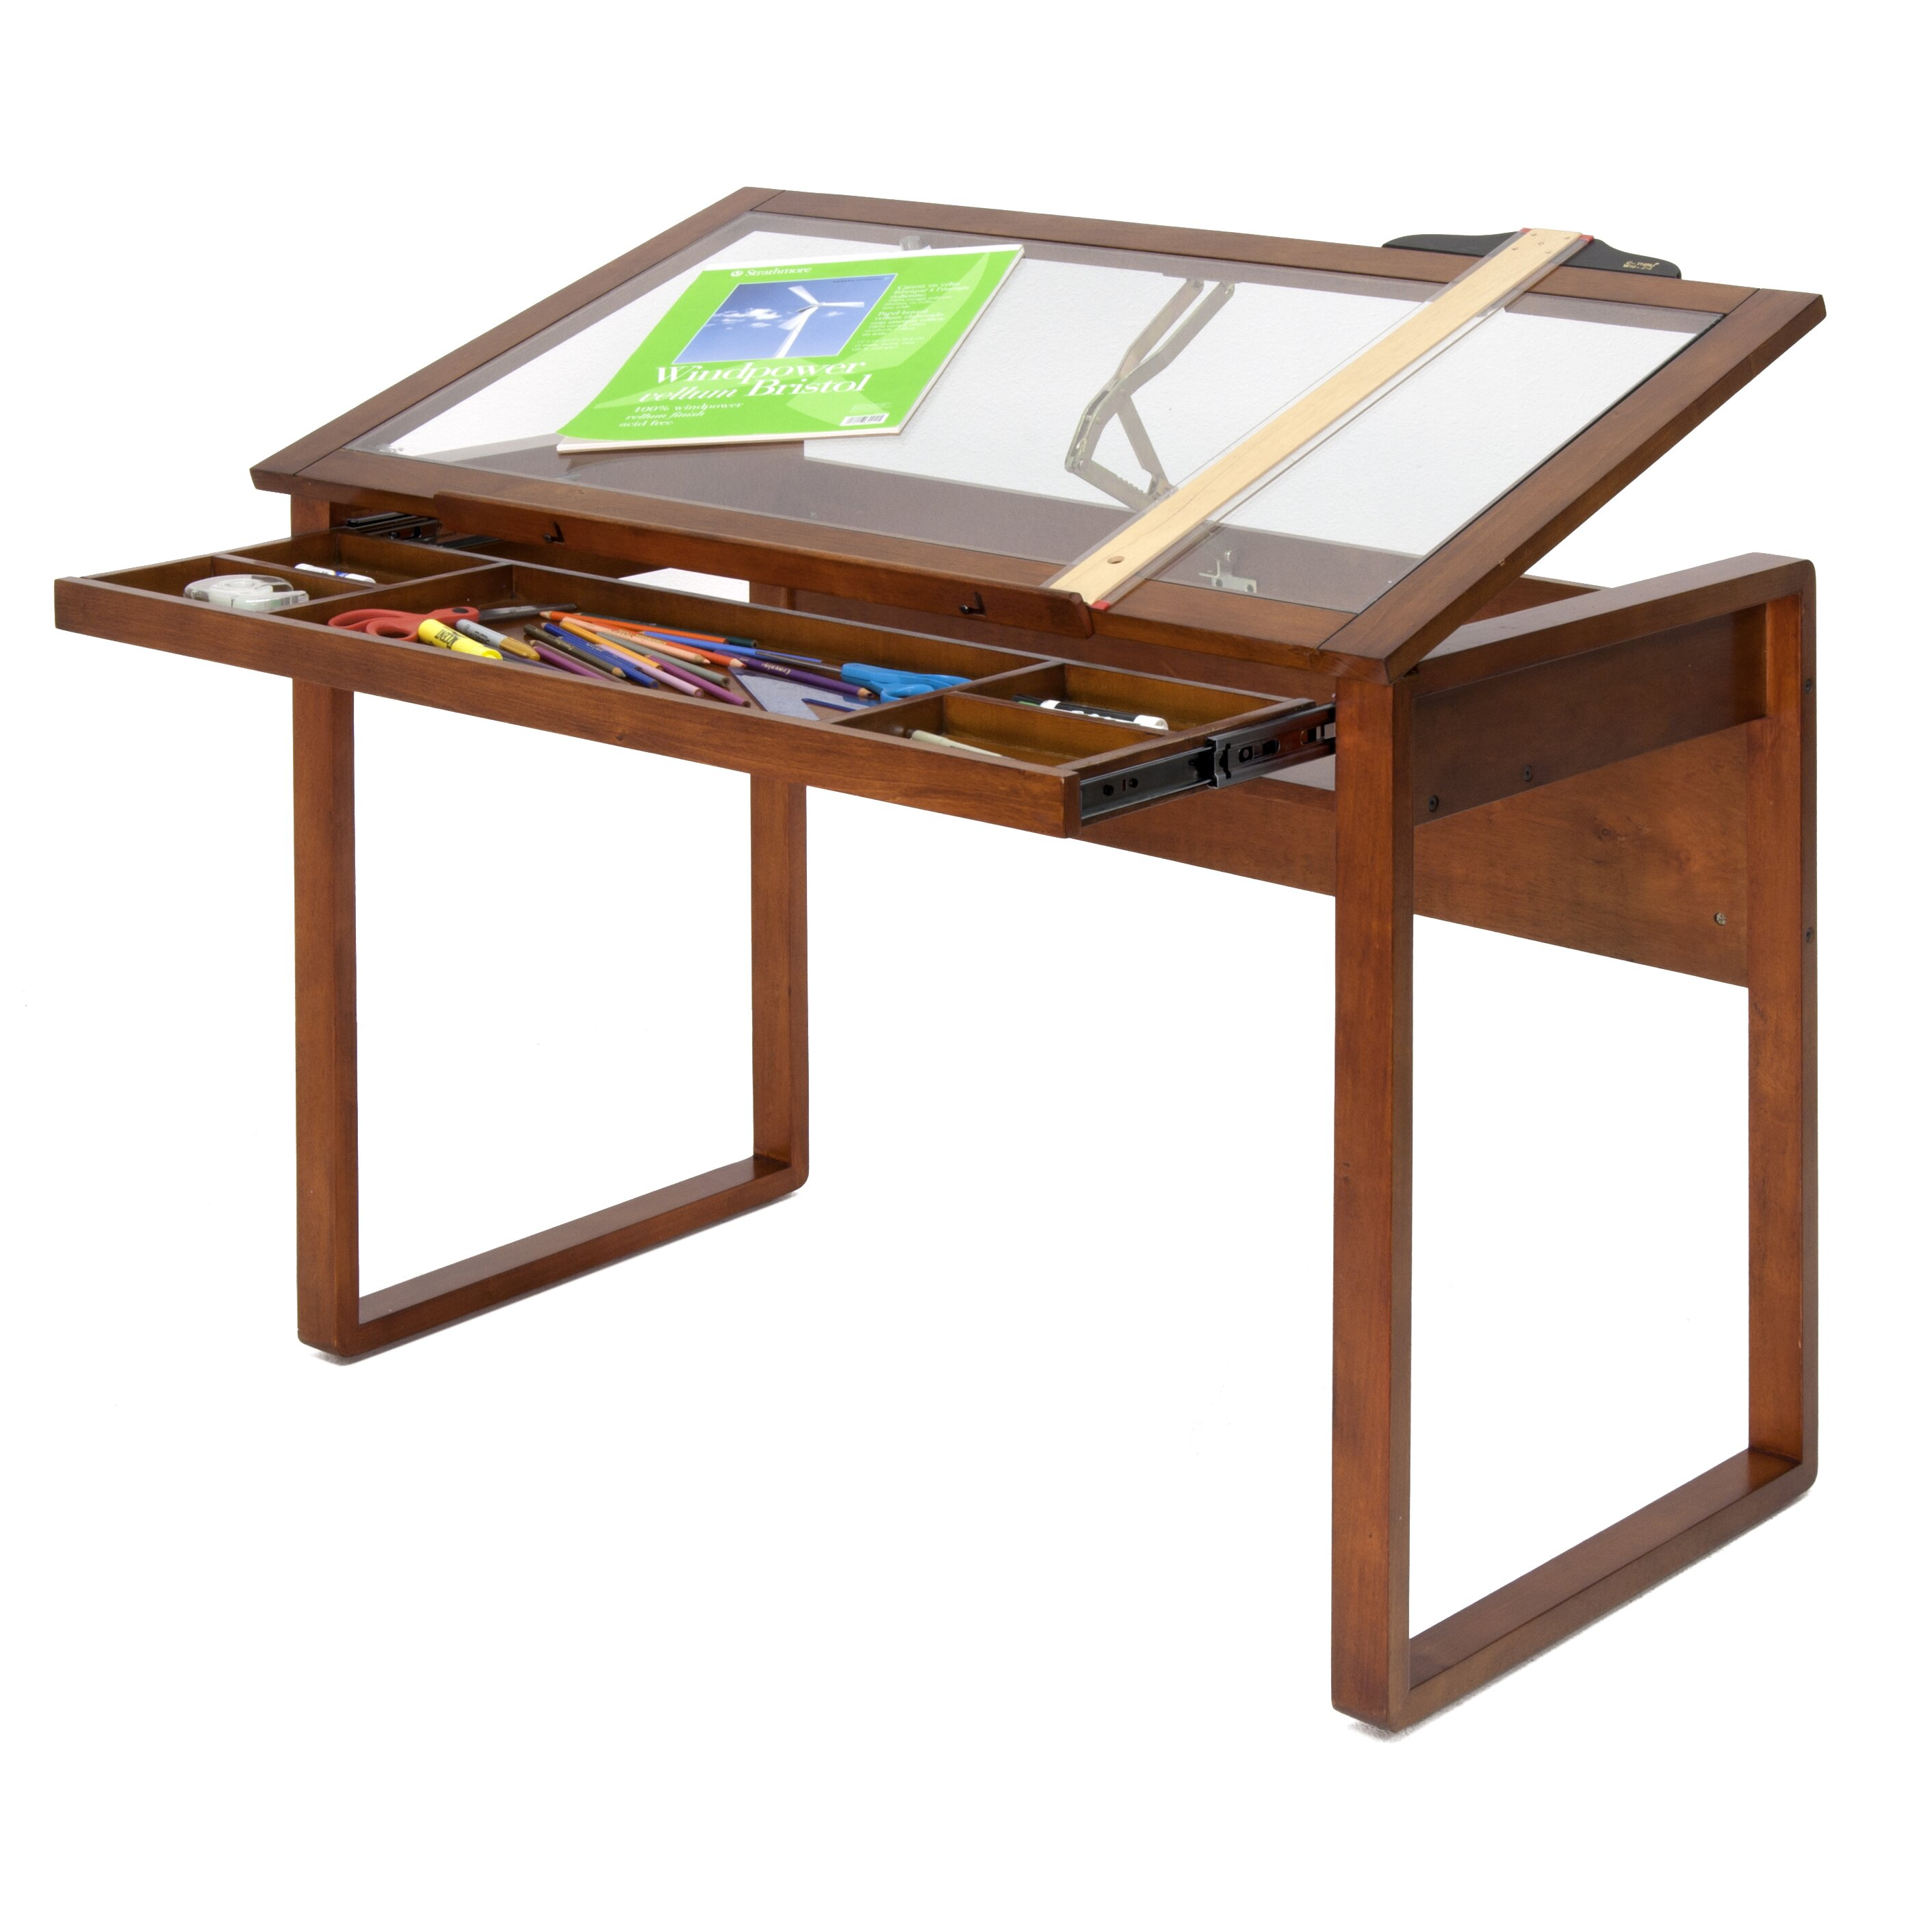 Studio designs ponderosa 42 w x 24 d drafting table reviews wayfair - Drafting table designs ...